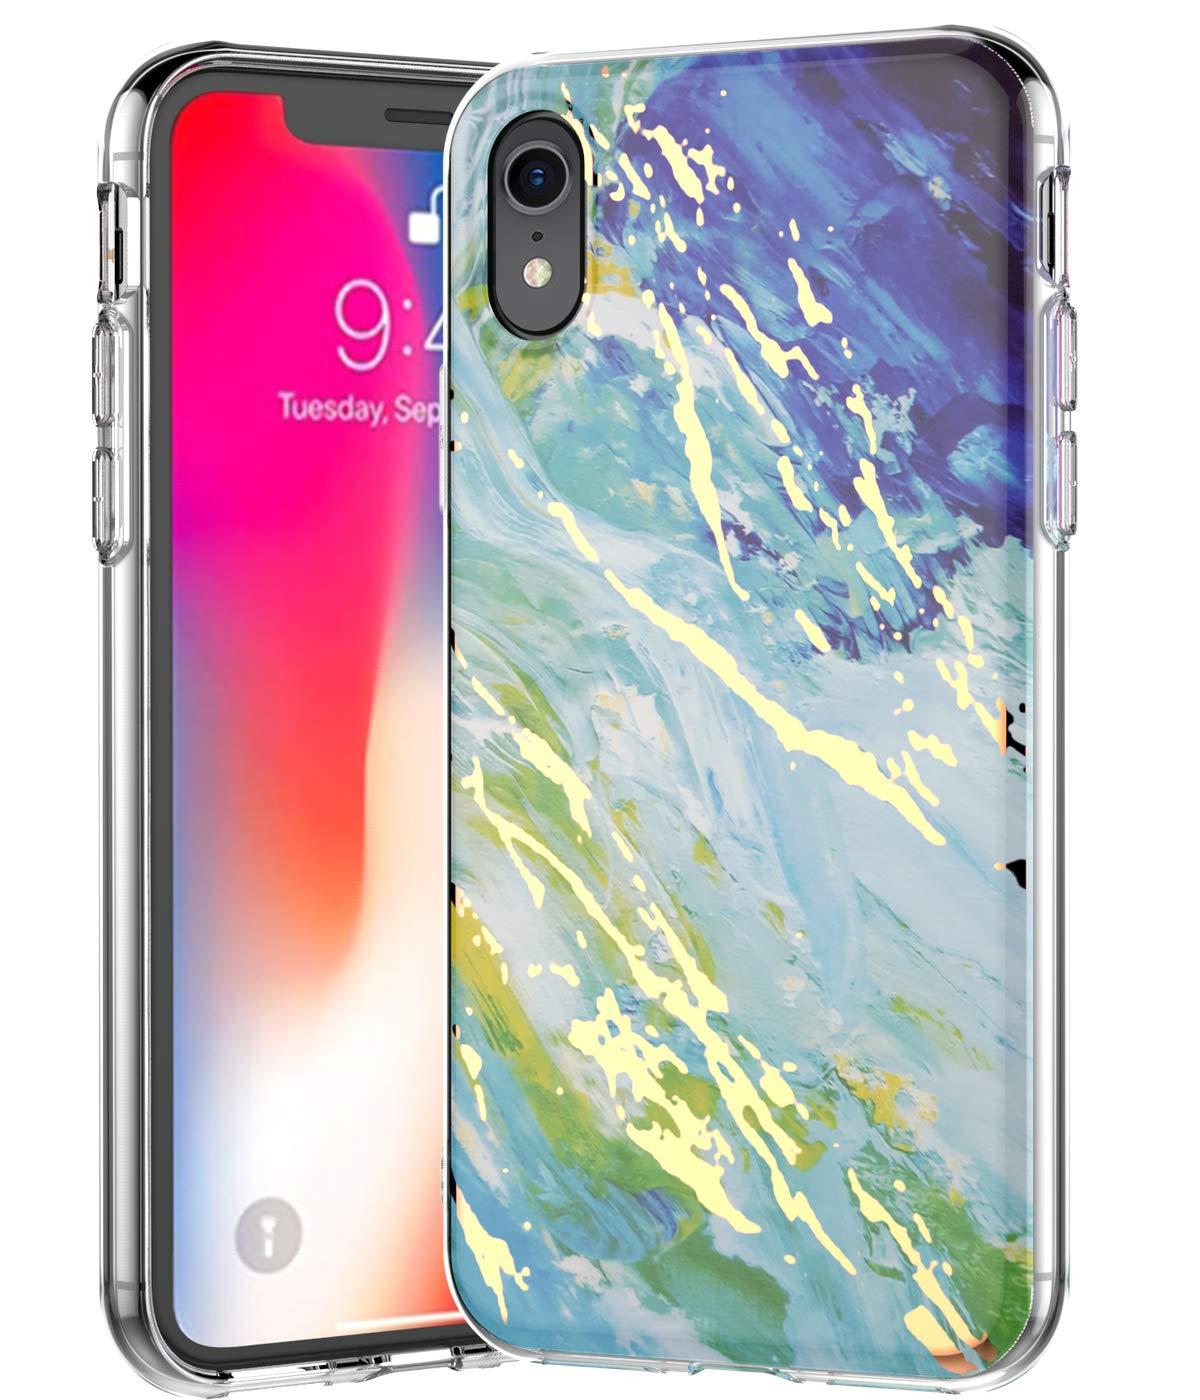 BSLVWG iPhone XRケースに対応超薄型大理石ストーンパターンハイブリッドハードバックソフトTPUレイズドエッジスリム保護ケース耐衝撃ケースカバーiPhone XR 6.1インチ(ブルー/グリーン)   B07H9PXL15